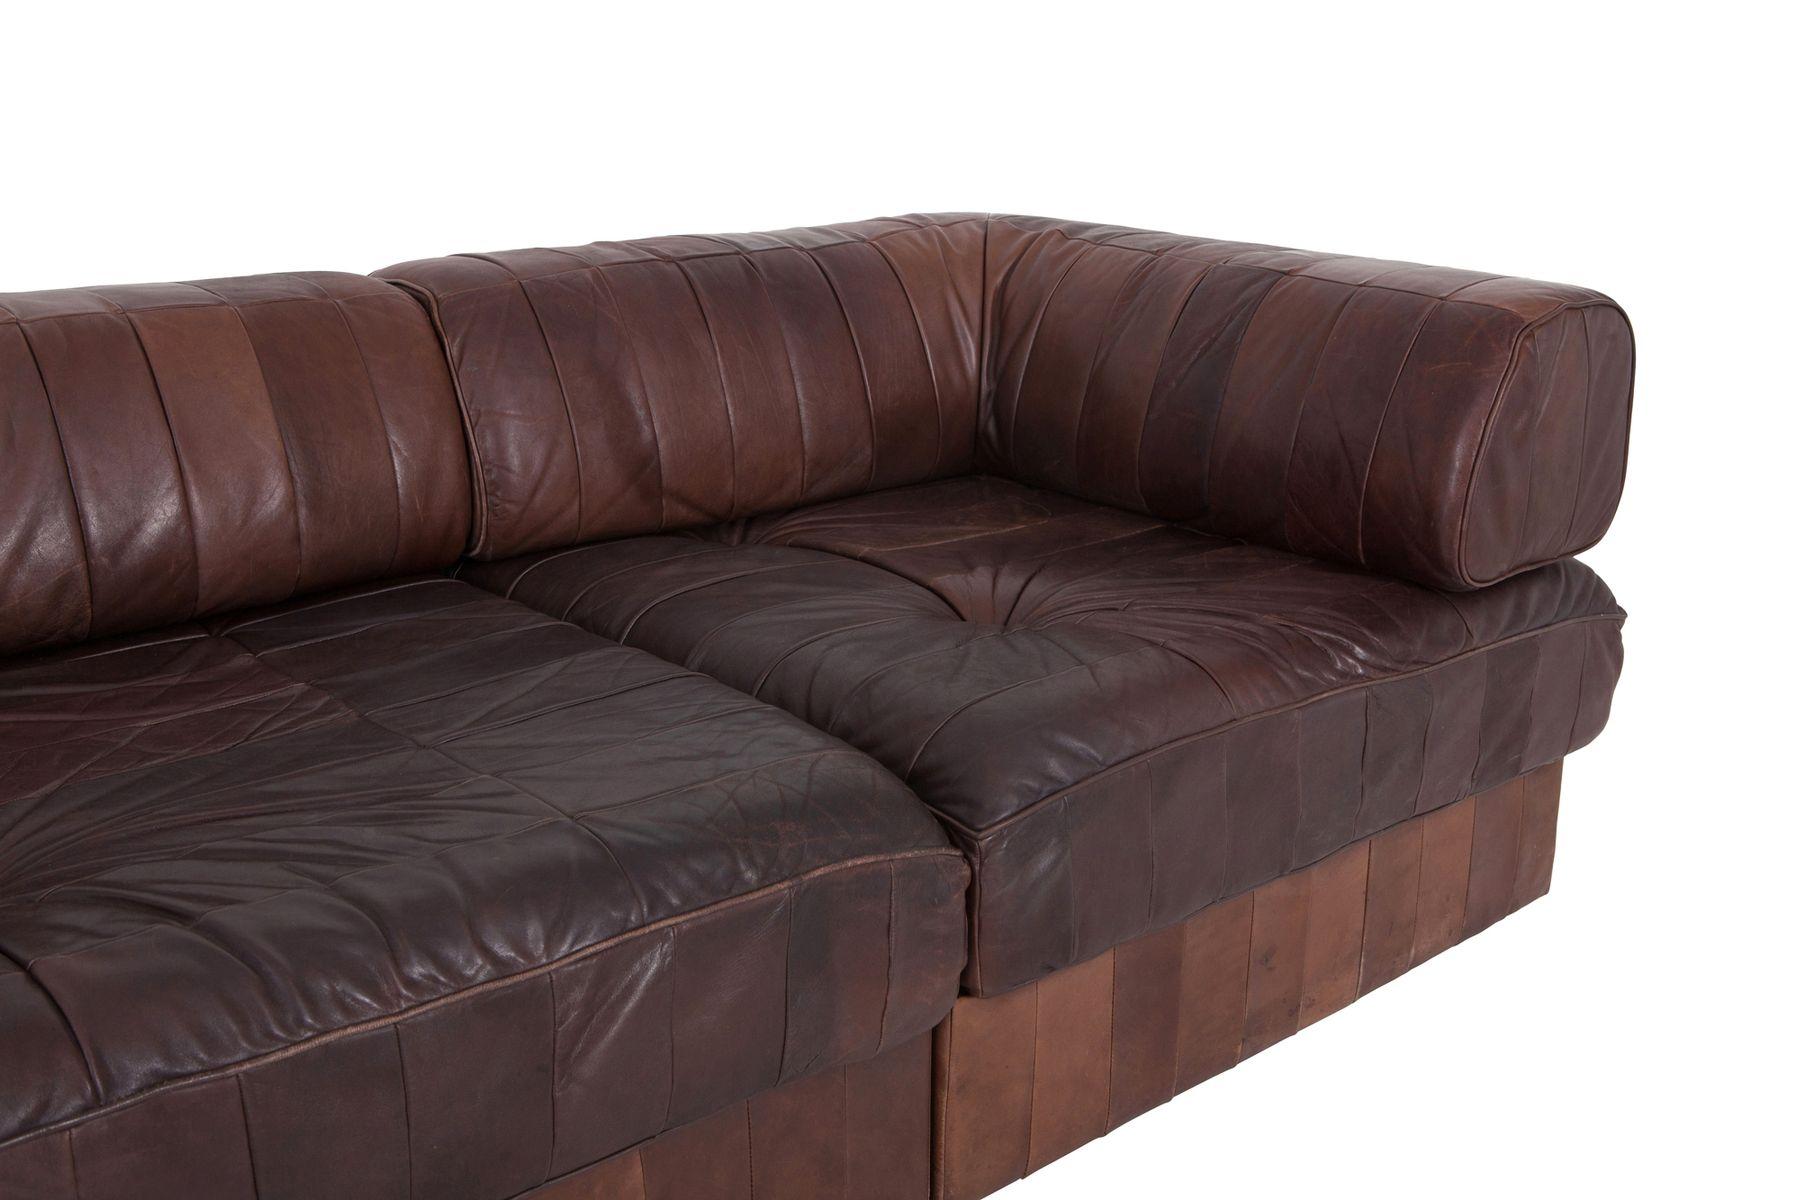 modulares braunes sofa aus cognac leder von de sede bei pamono kaufen. Black Bedroom Furniture Sets. Home Design Ideas